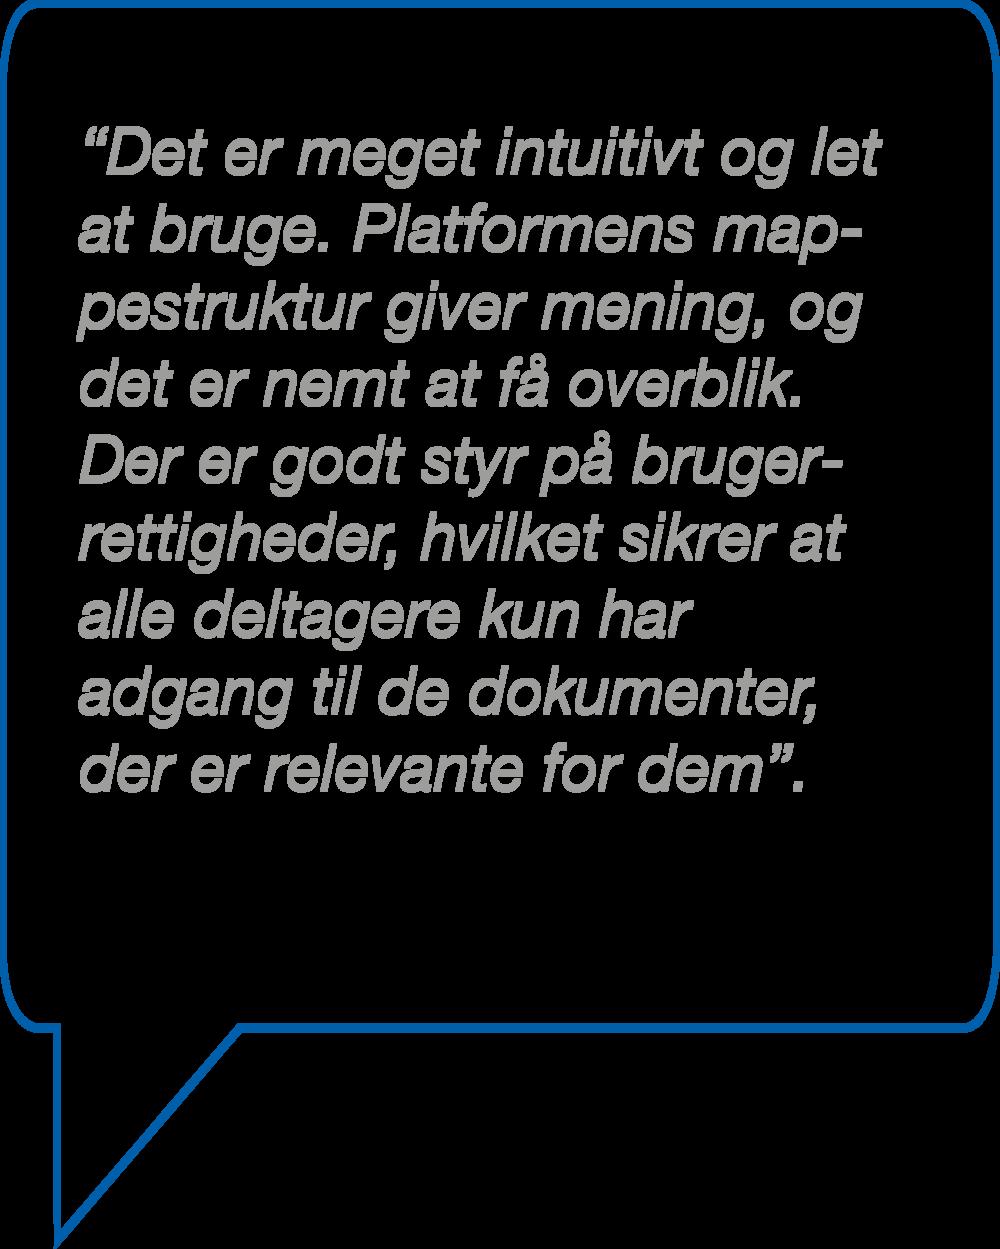 Aarhus Letbane case RIB Byggeweb